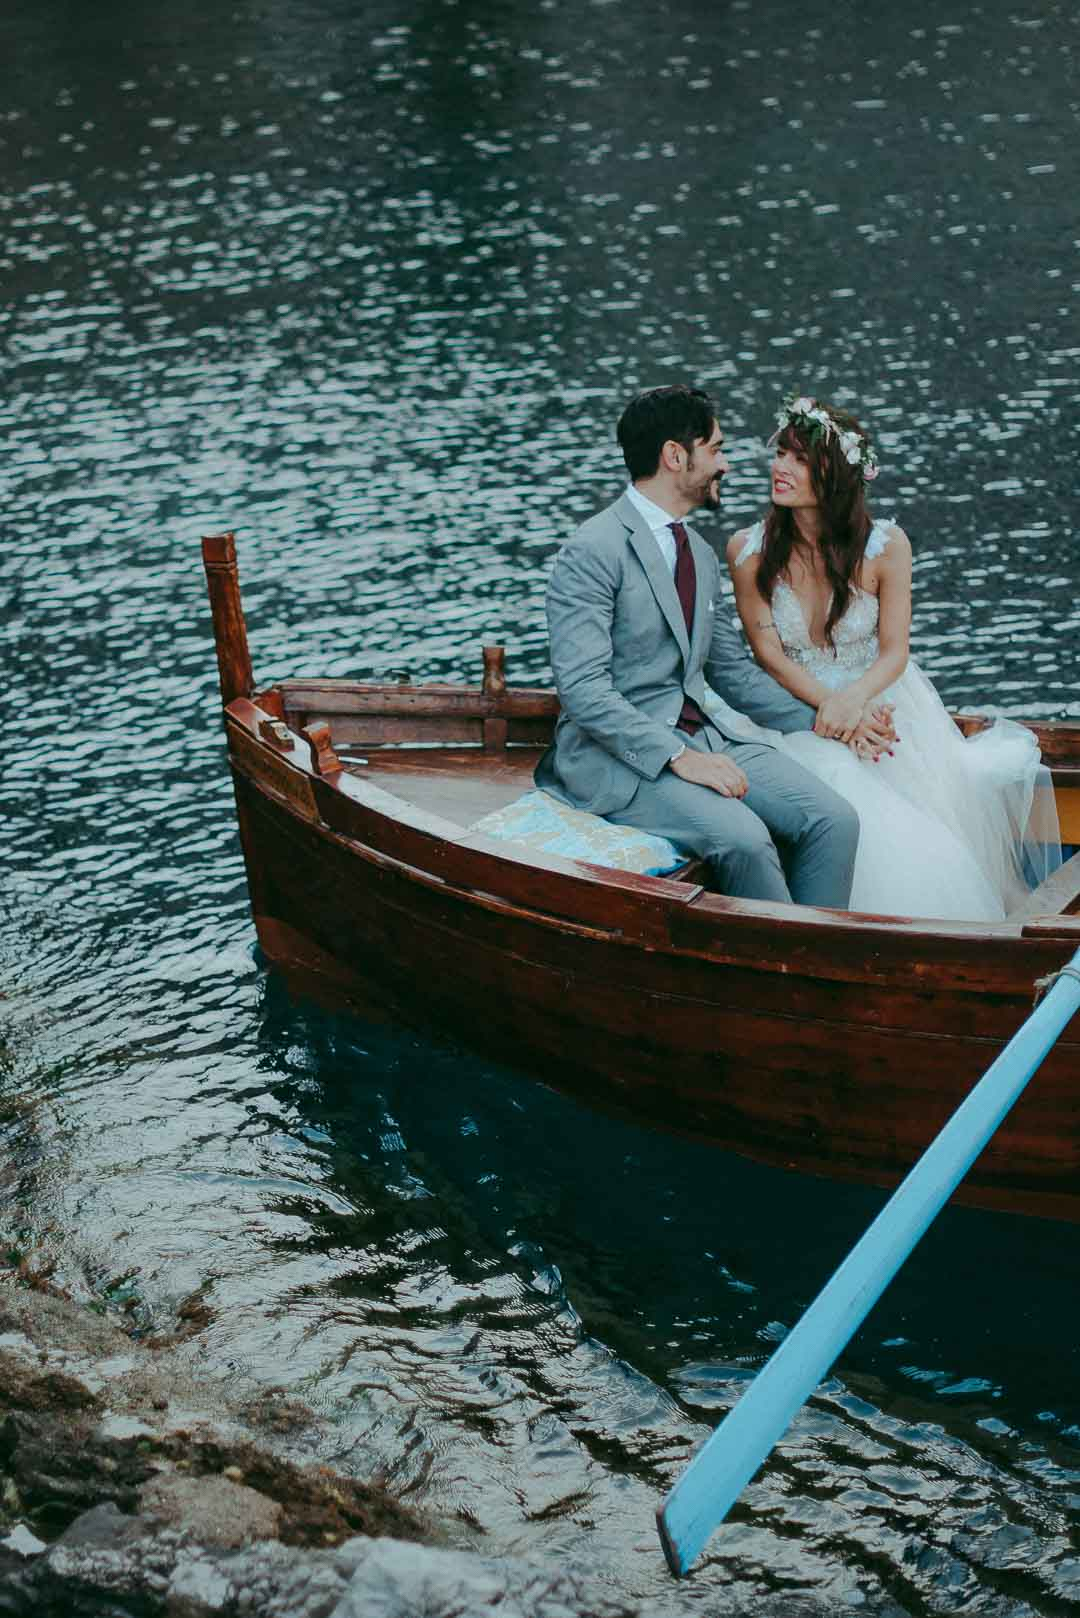 wedding-photographer-destination-fineart-bespoke-reportage-amalficoast-torrelacerniola-vivianeizzo-spazio46-72